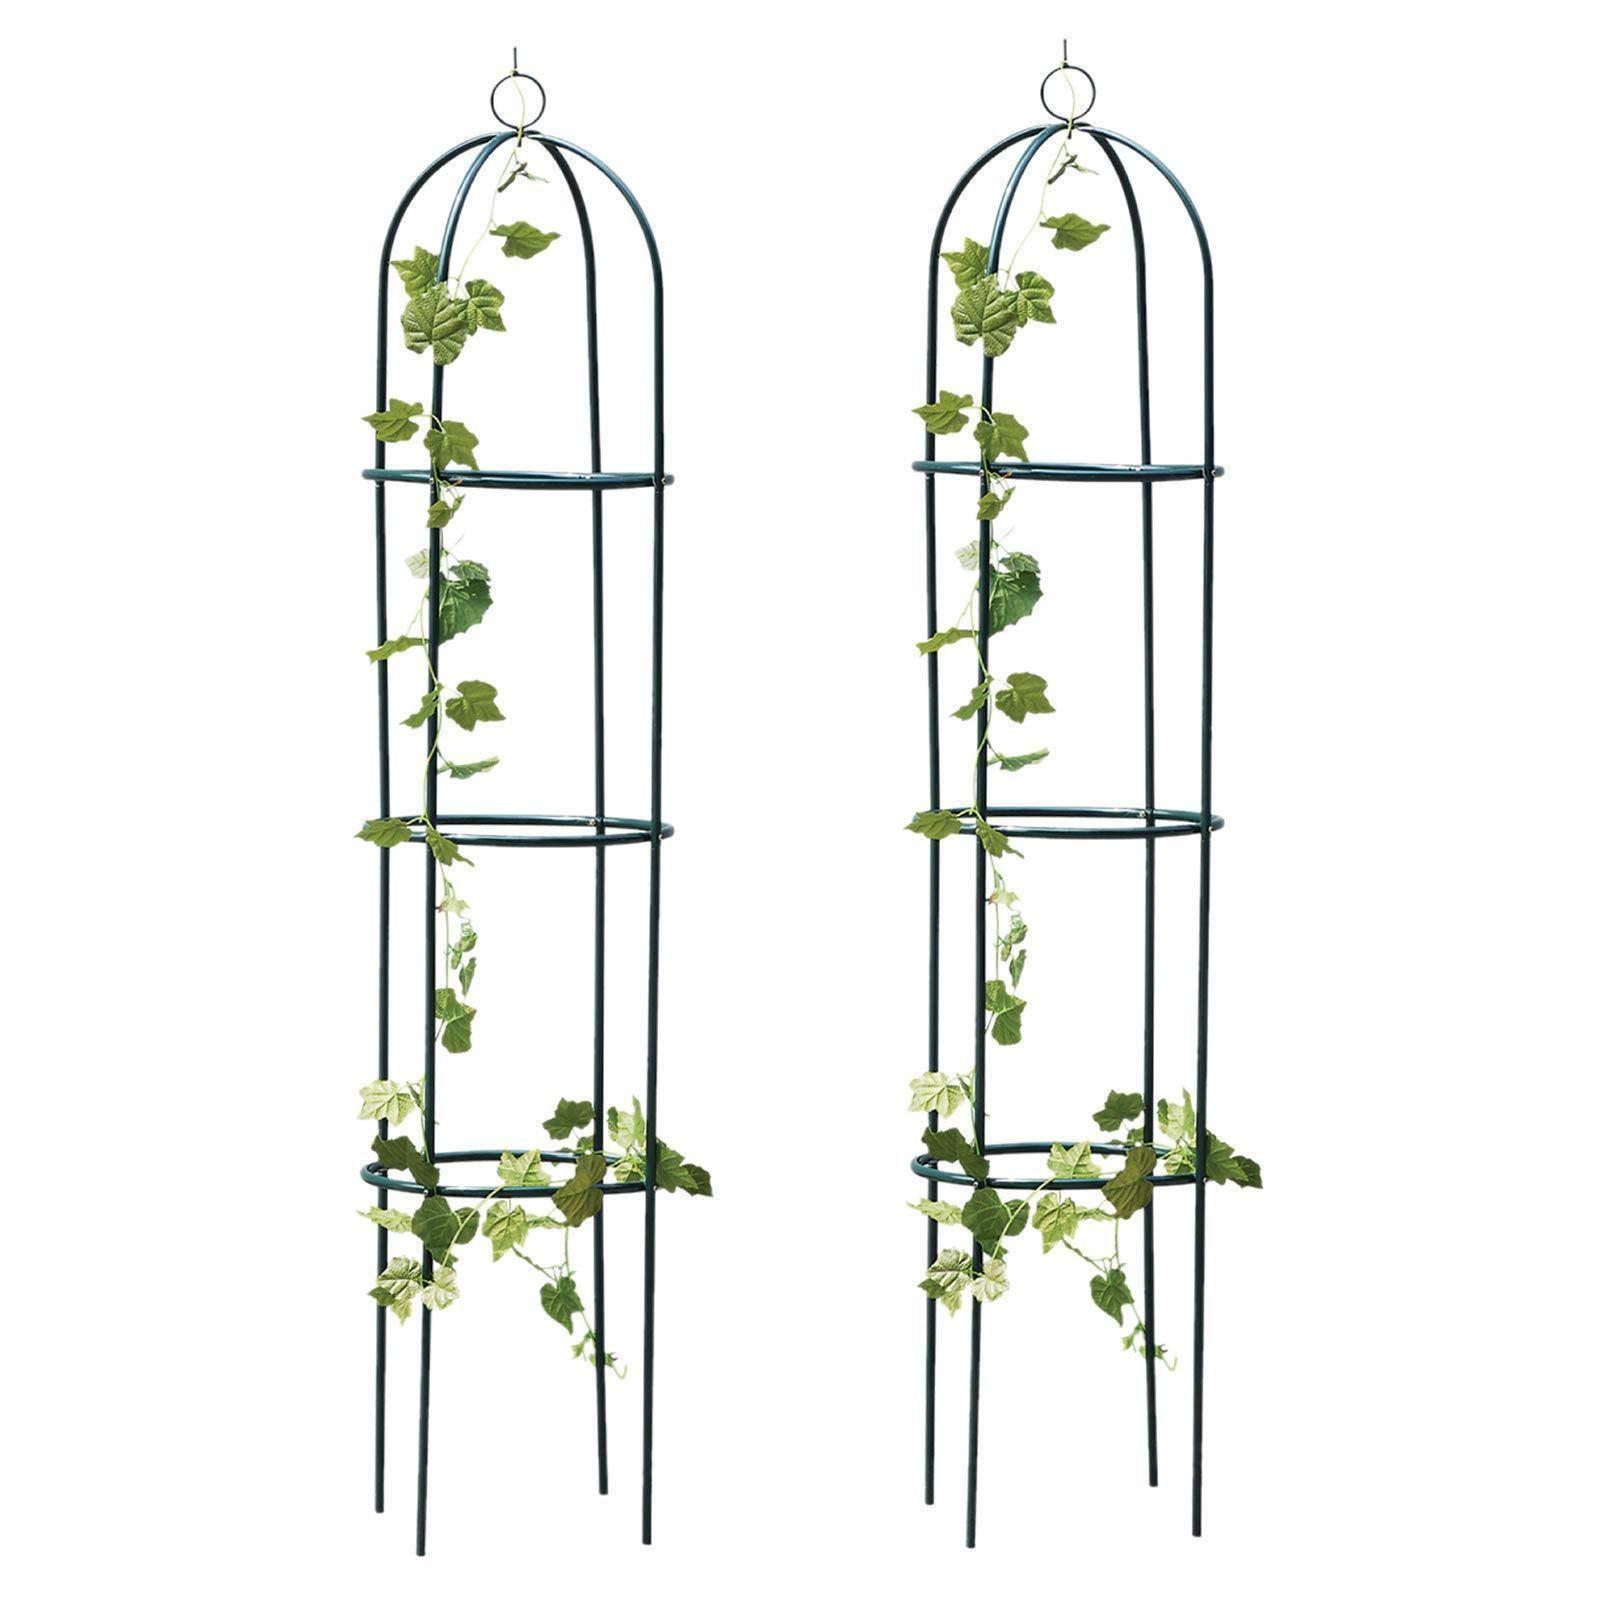 Faboer 2 x 1.9 m Metal Garden Outdoor Obelisk Climbing Plant Support Frame Trellis